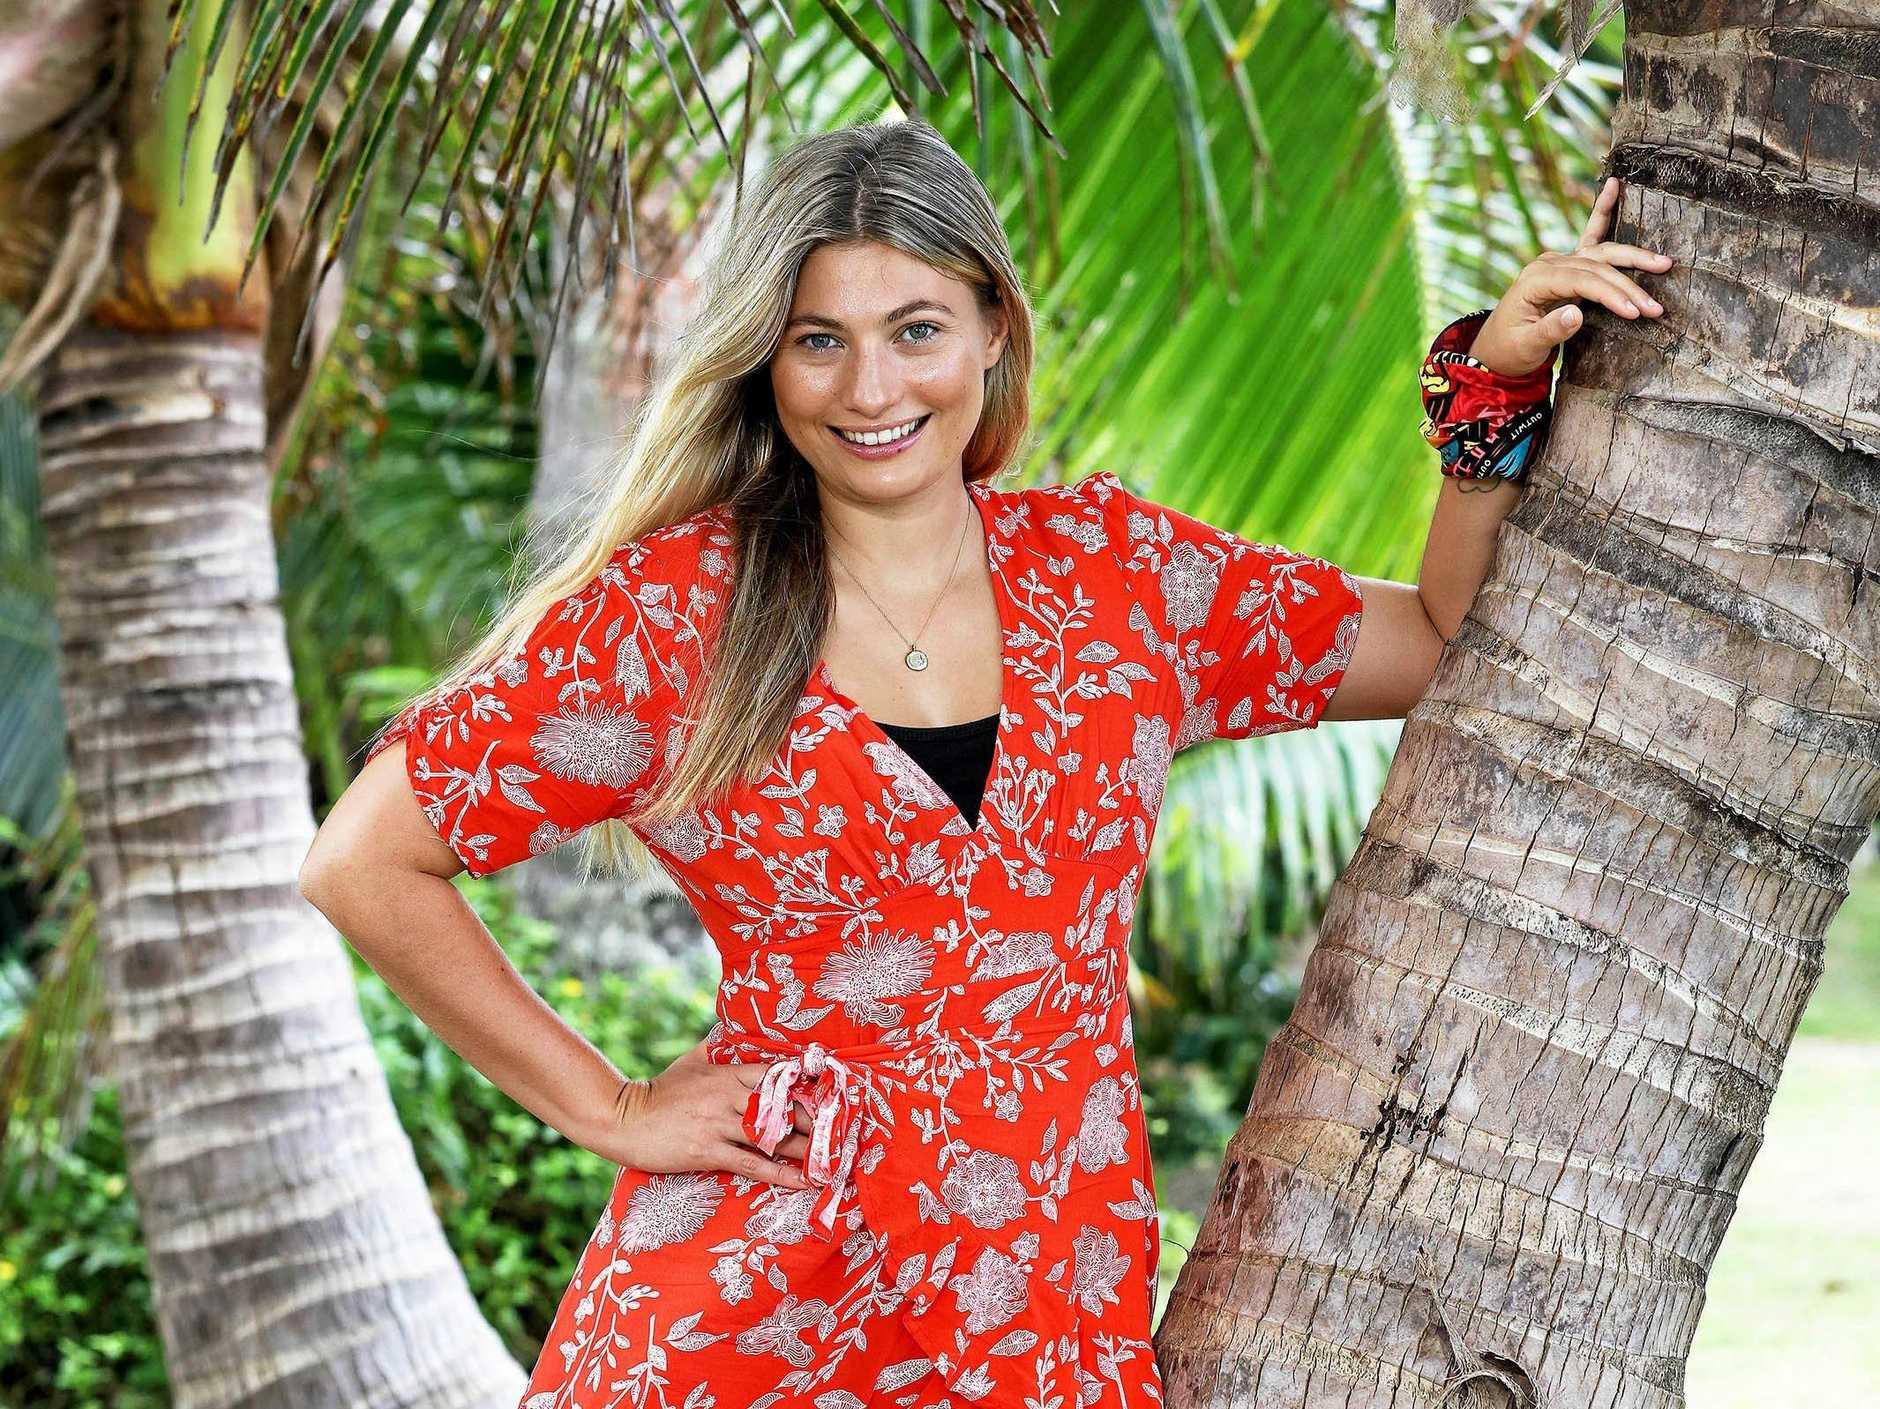 Tewantin's Shonee Bowtell is a contestant on the new season of Australian Survivor: Champions vs Contenders.